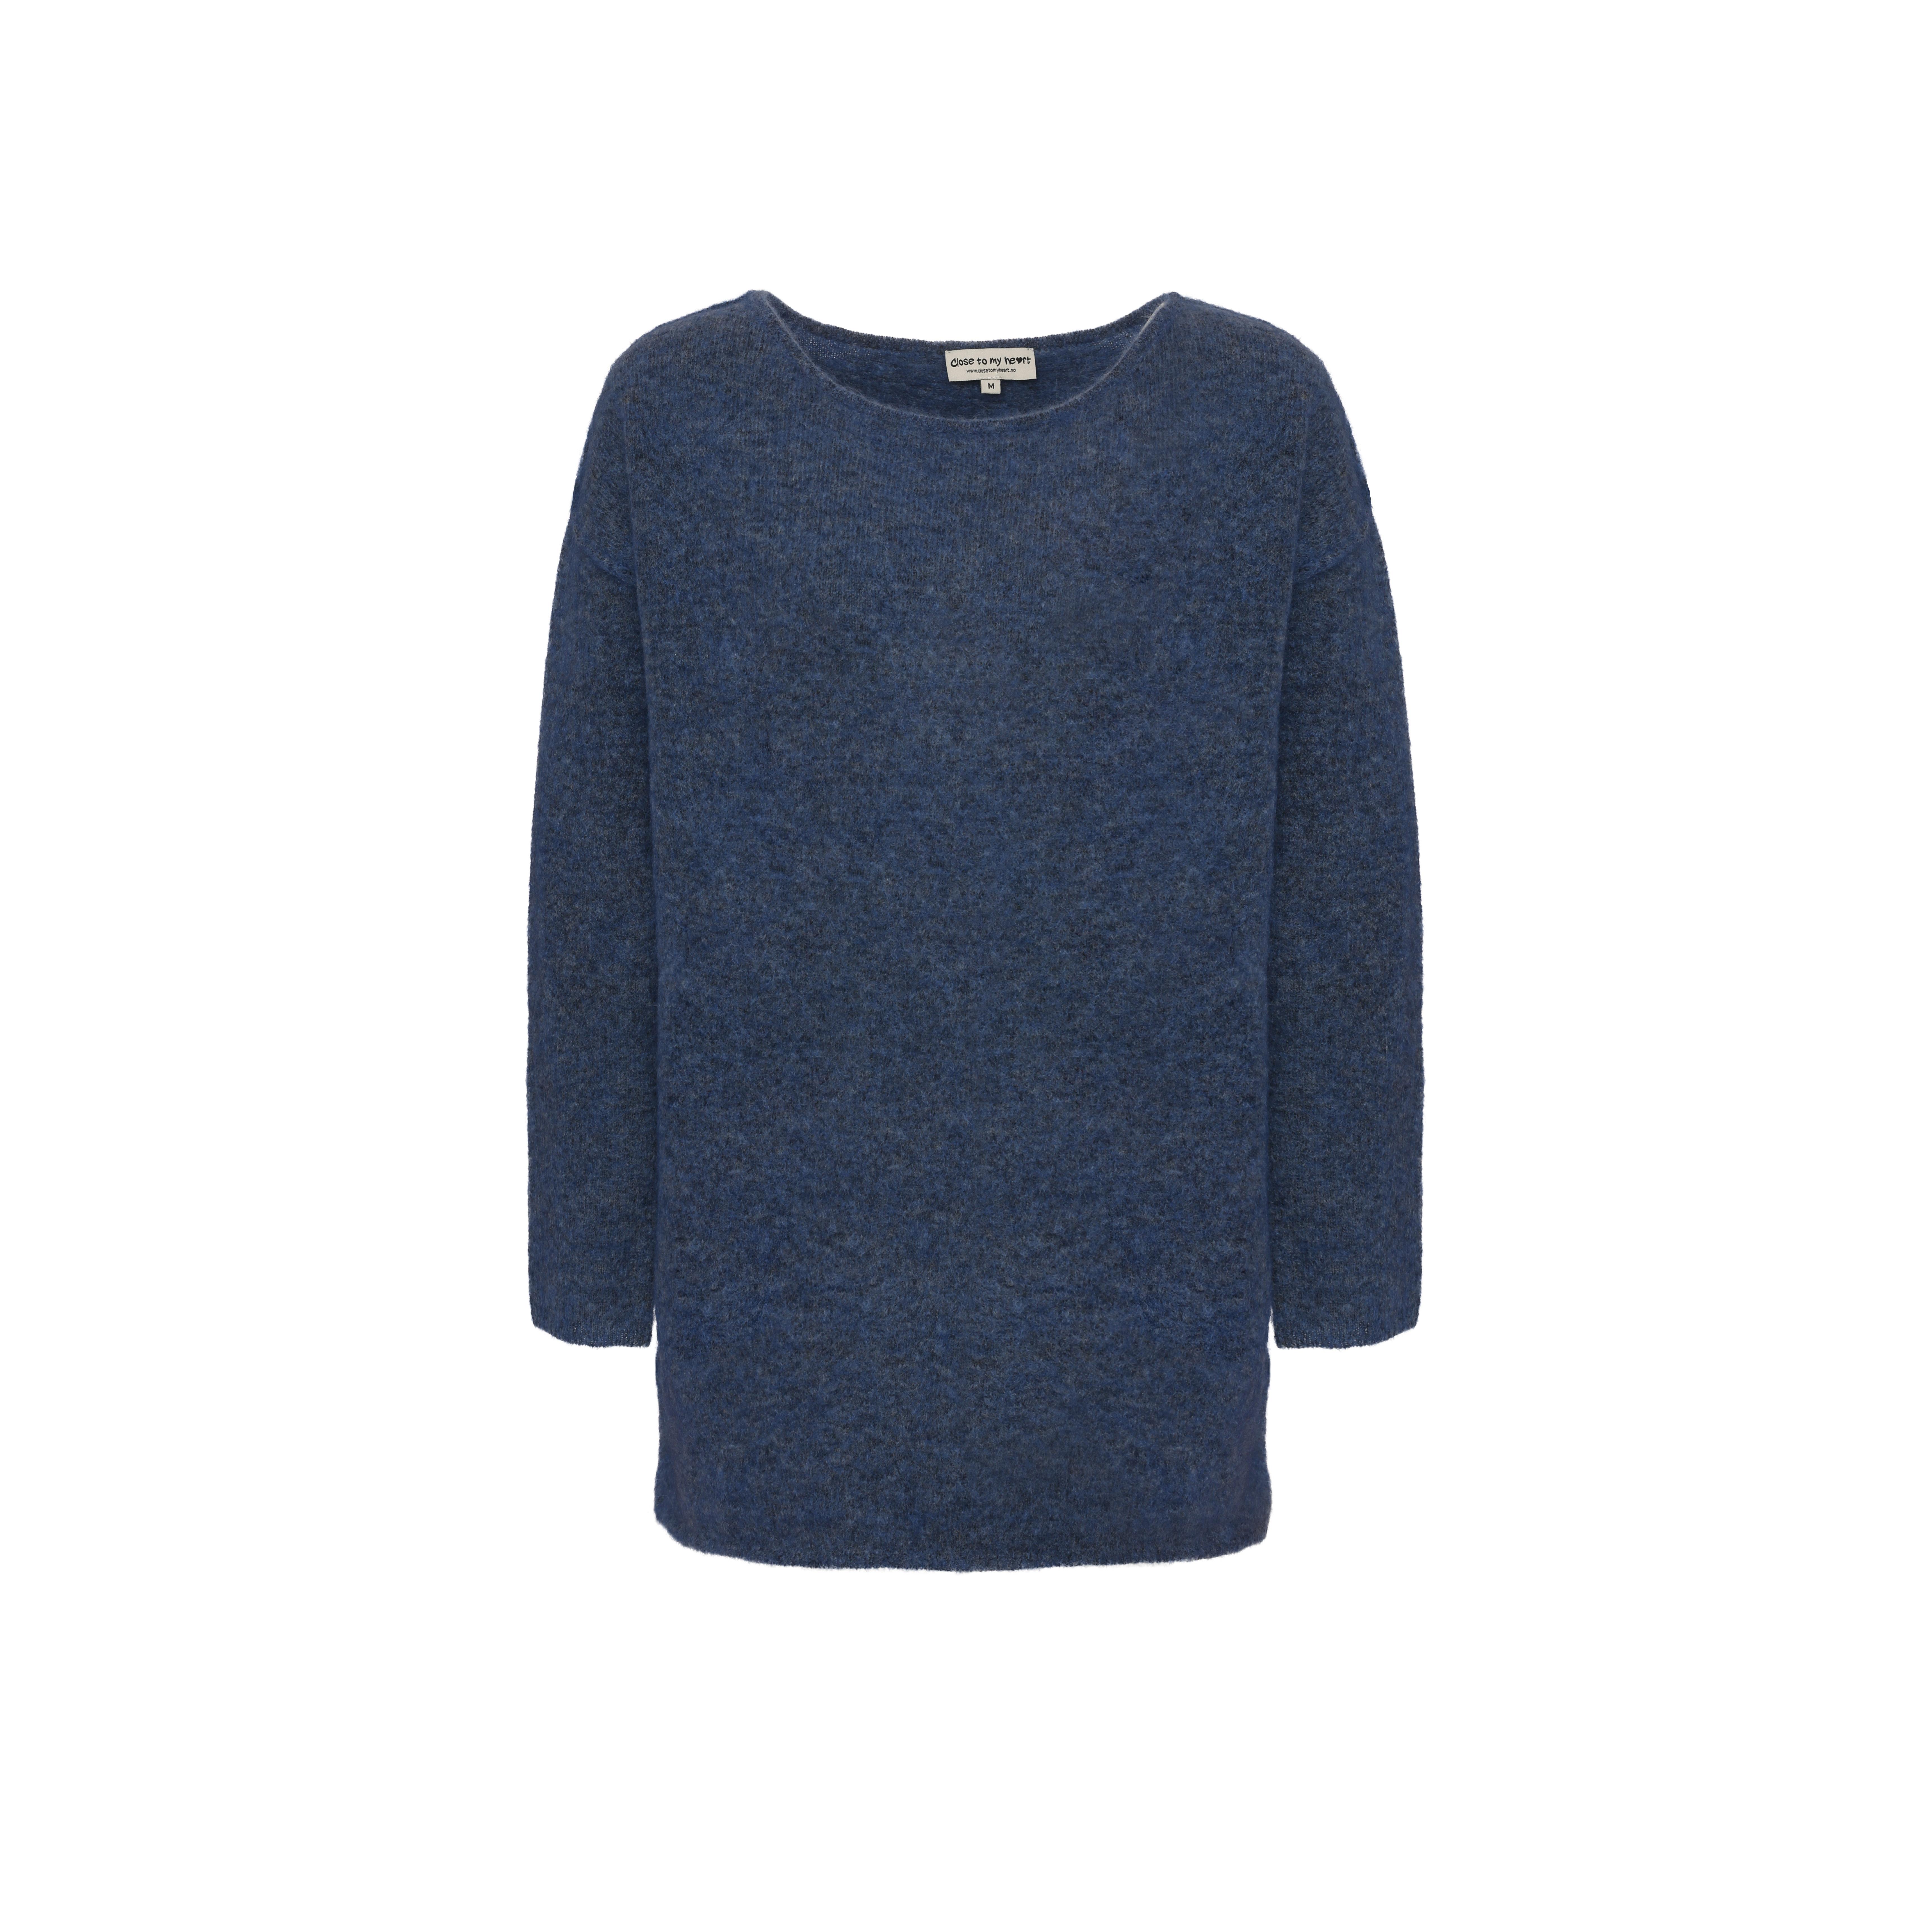 Loveday sweater